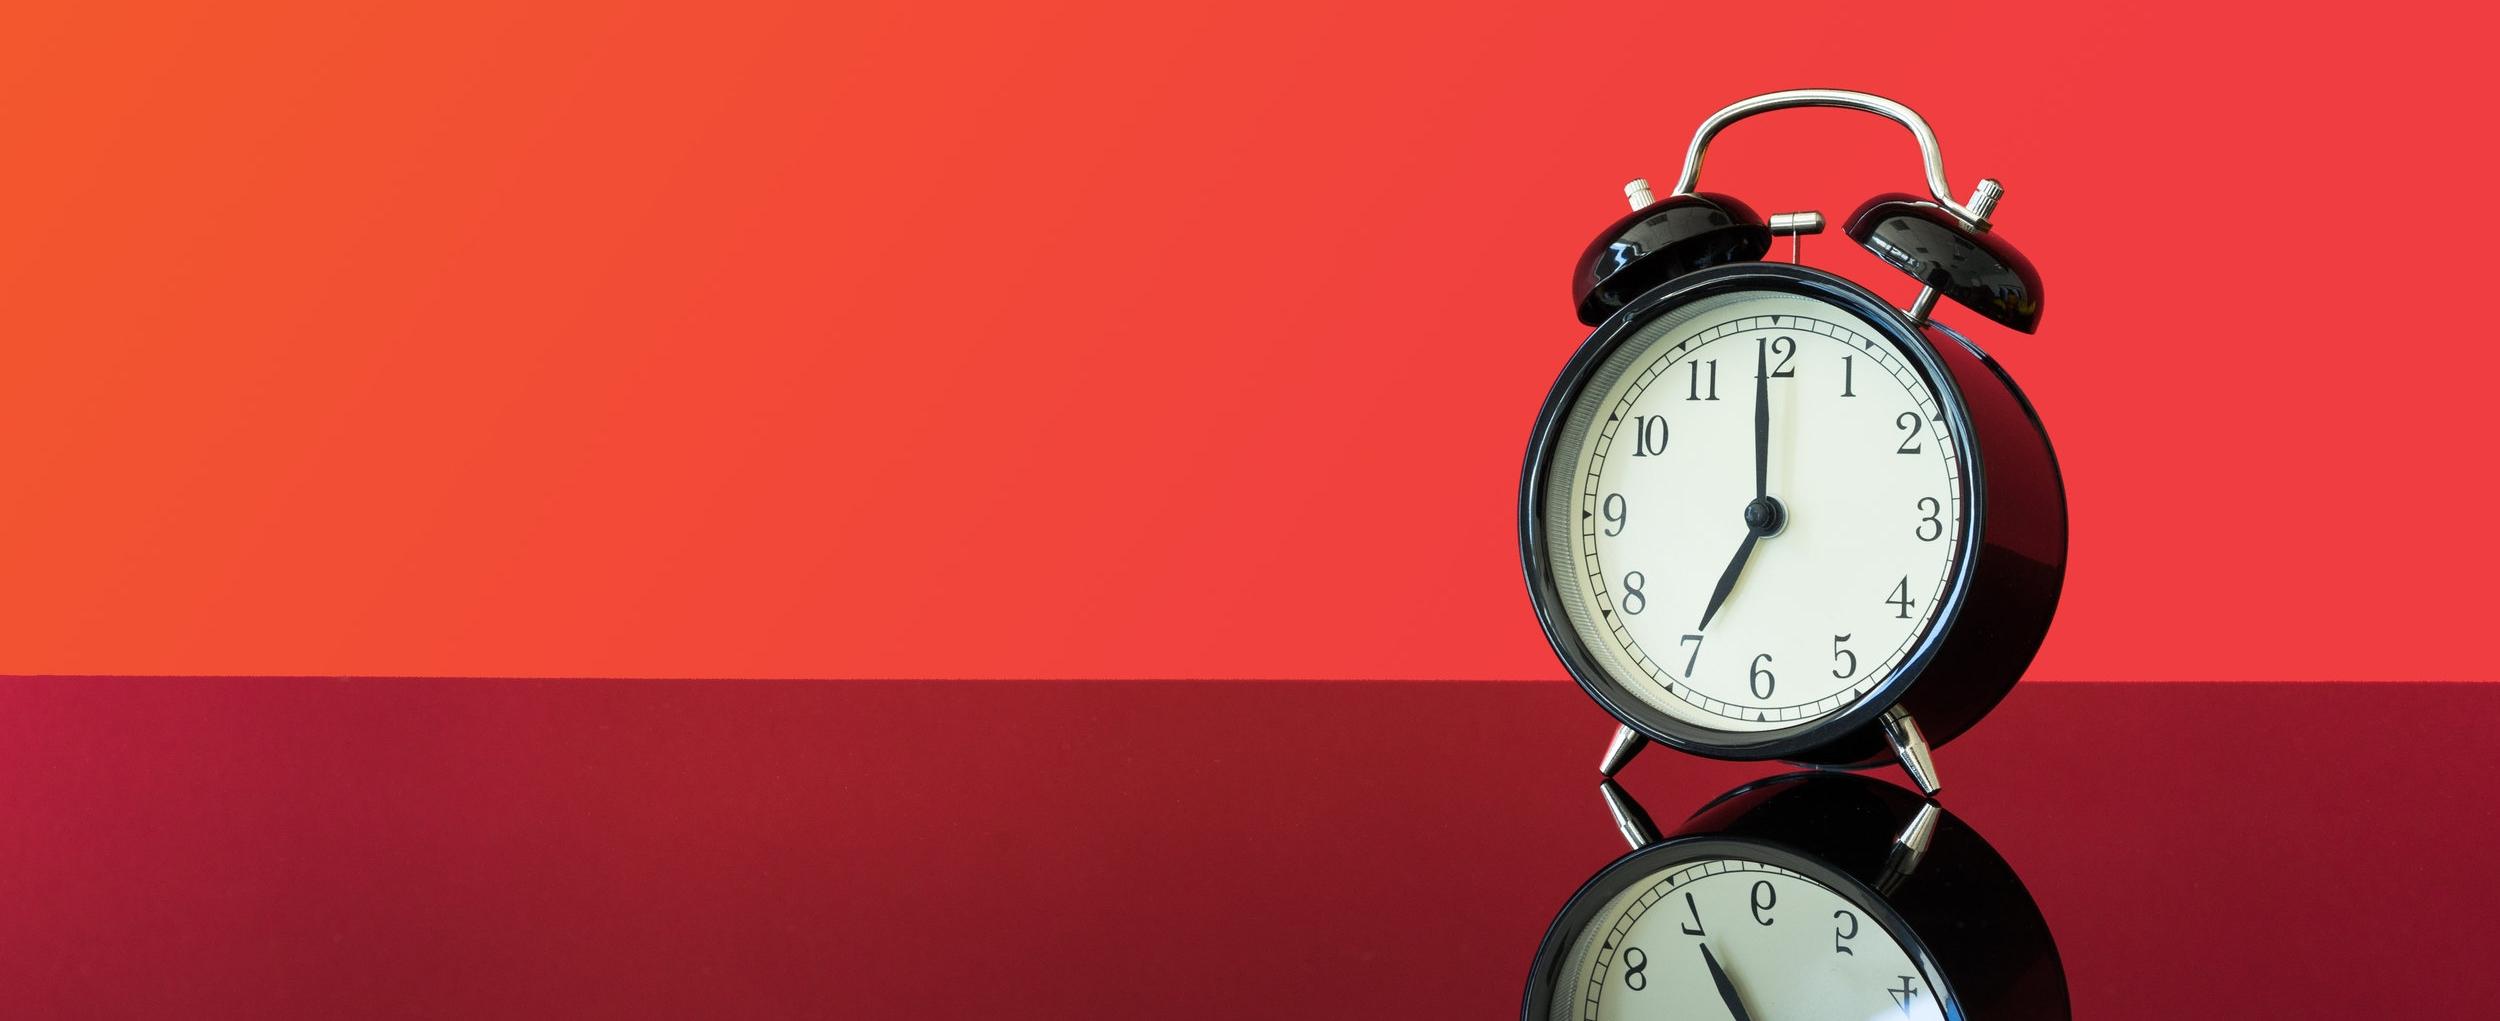 vintage-alarm-clock-picjumbo-com.jpg